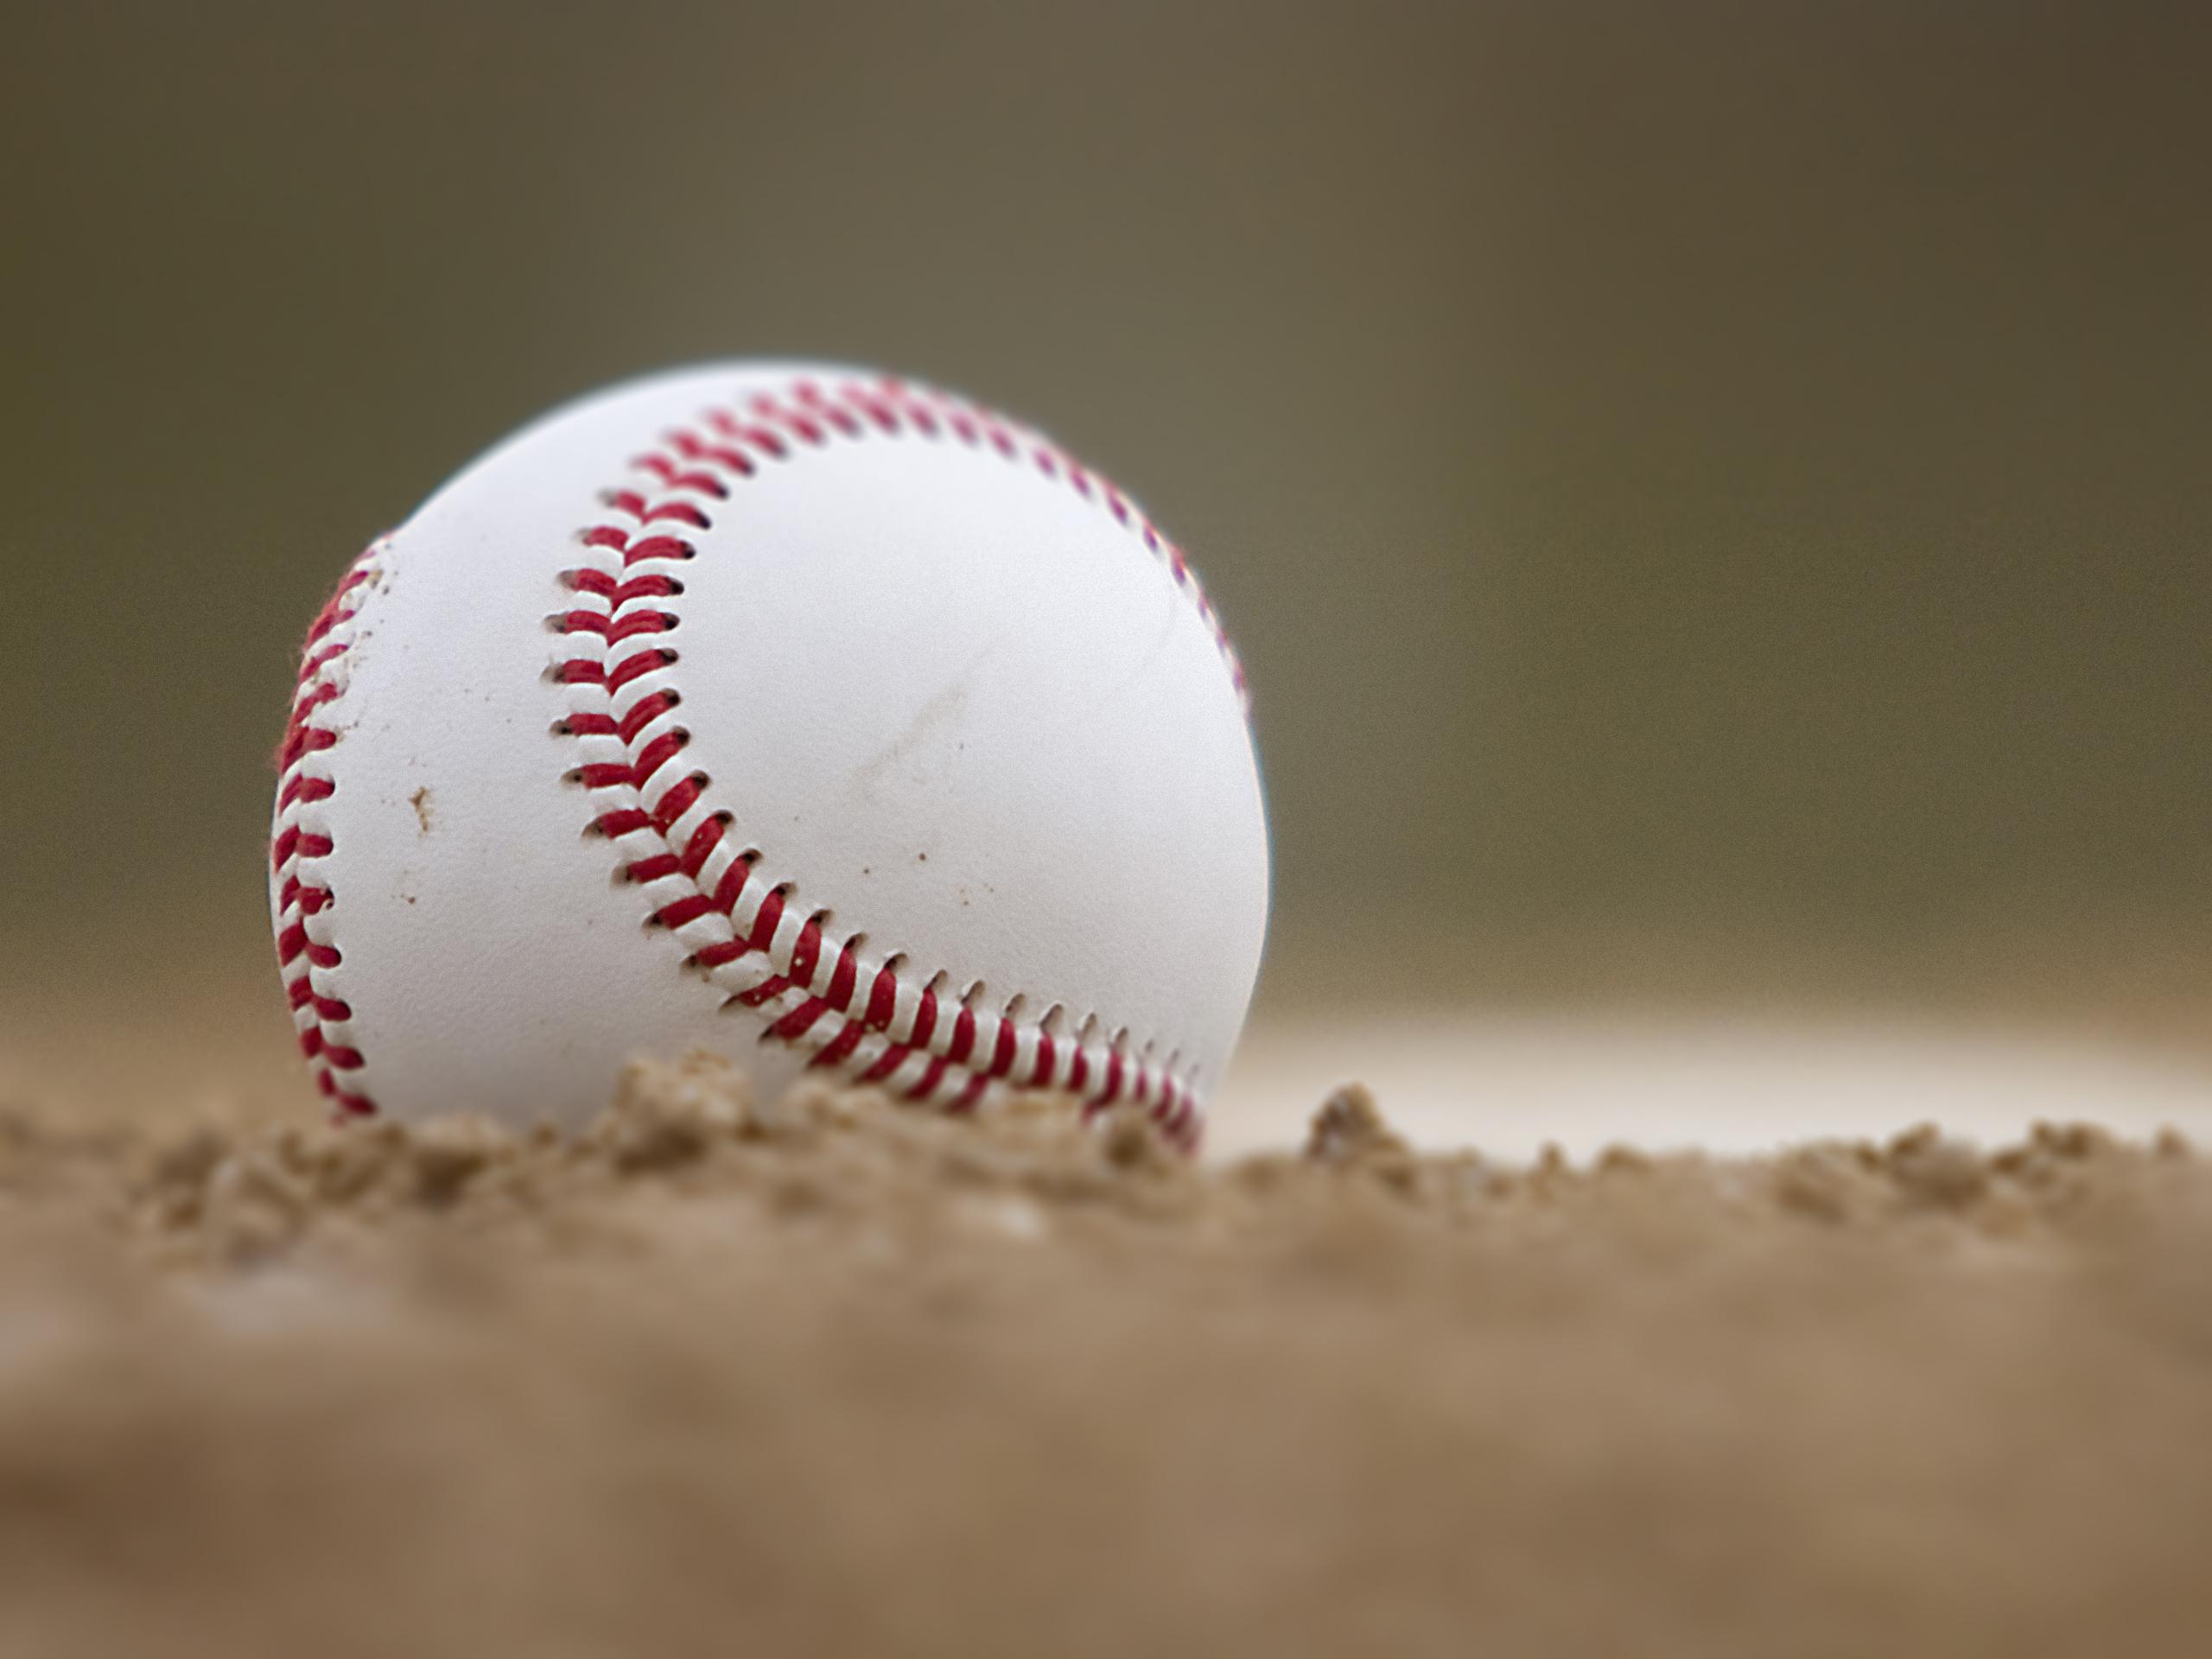 Baseball Wallpapers Desktop 2560x1920